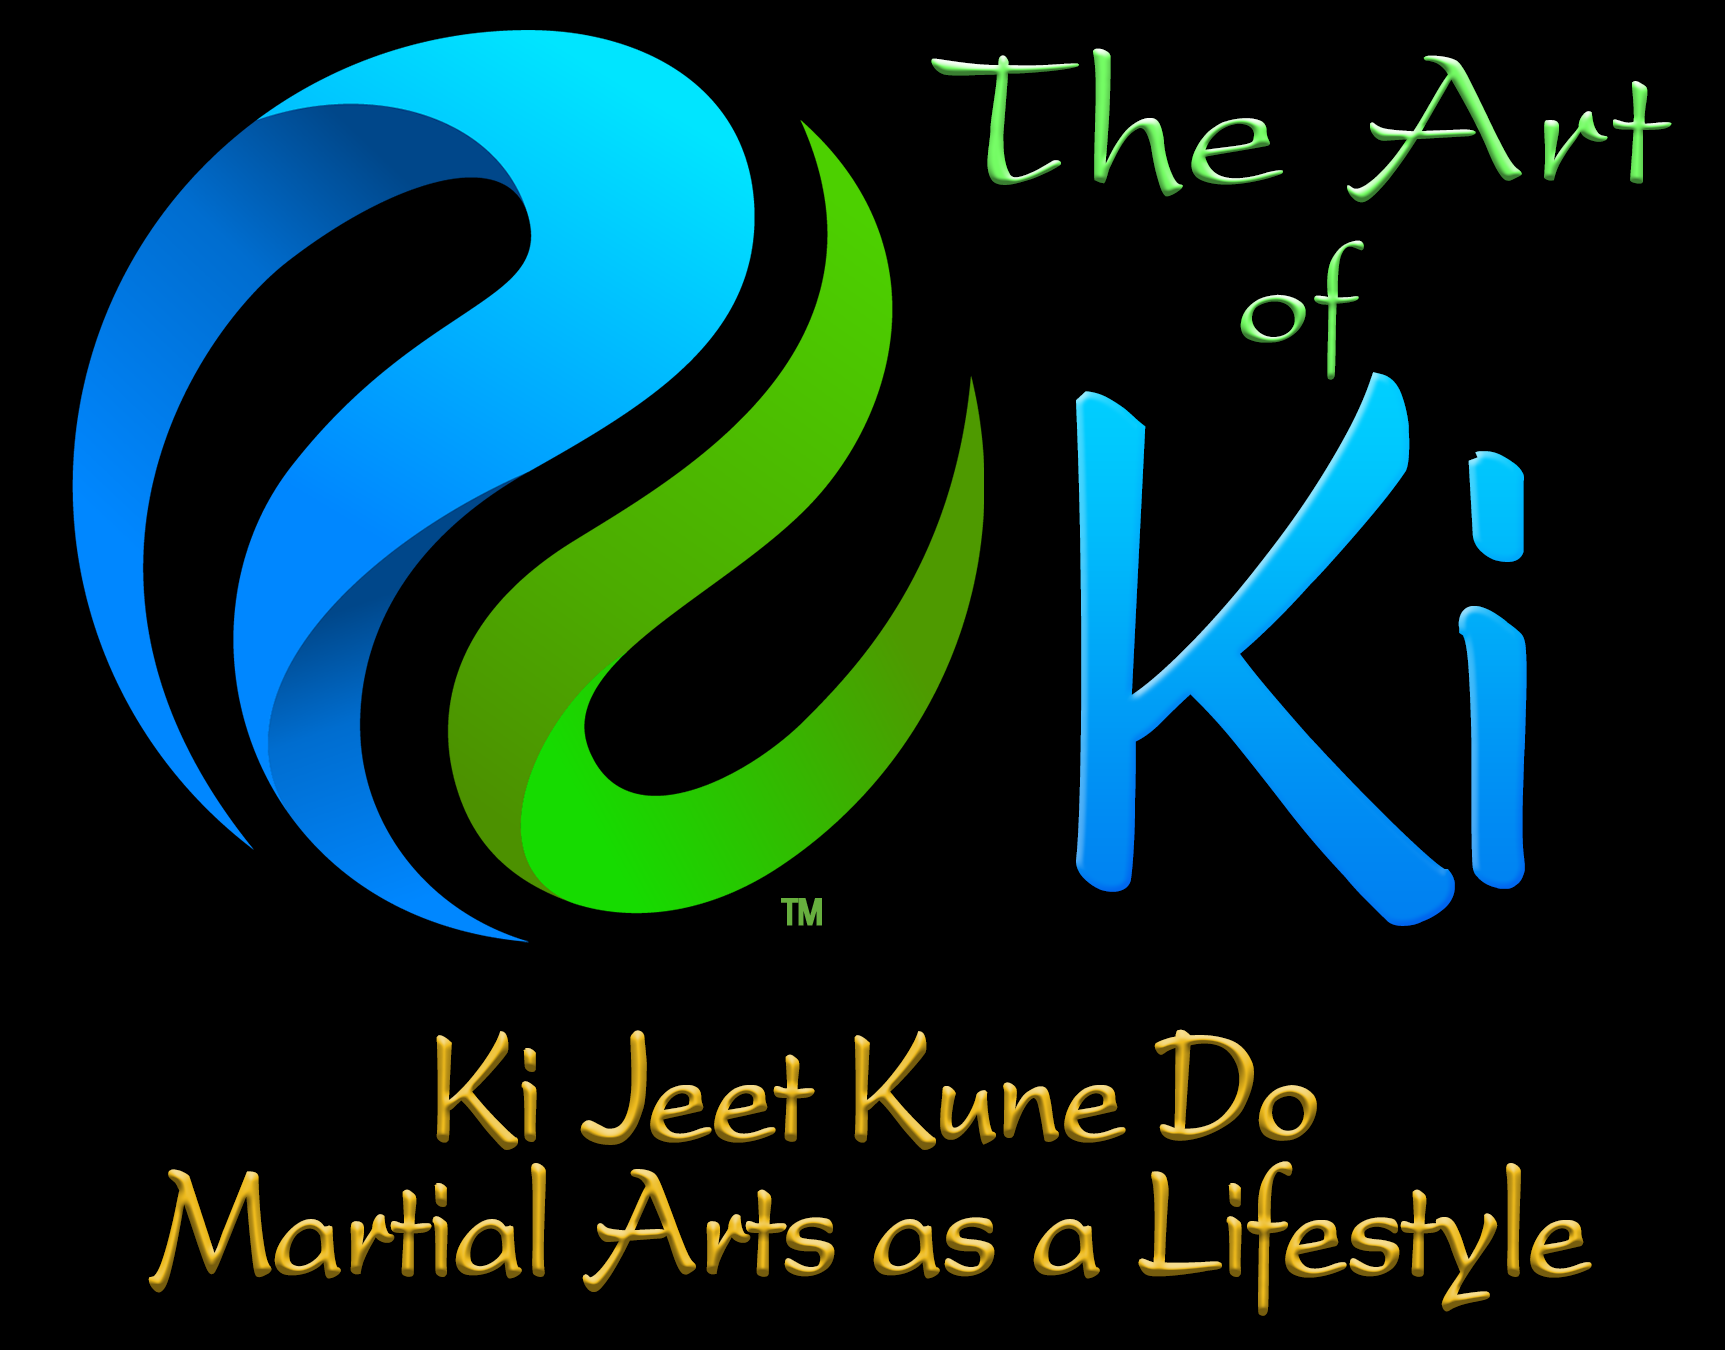 Ki Martial Arts - The Art of Ki - Ki Jeet Kune Do - Ki JKD